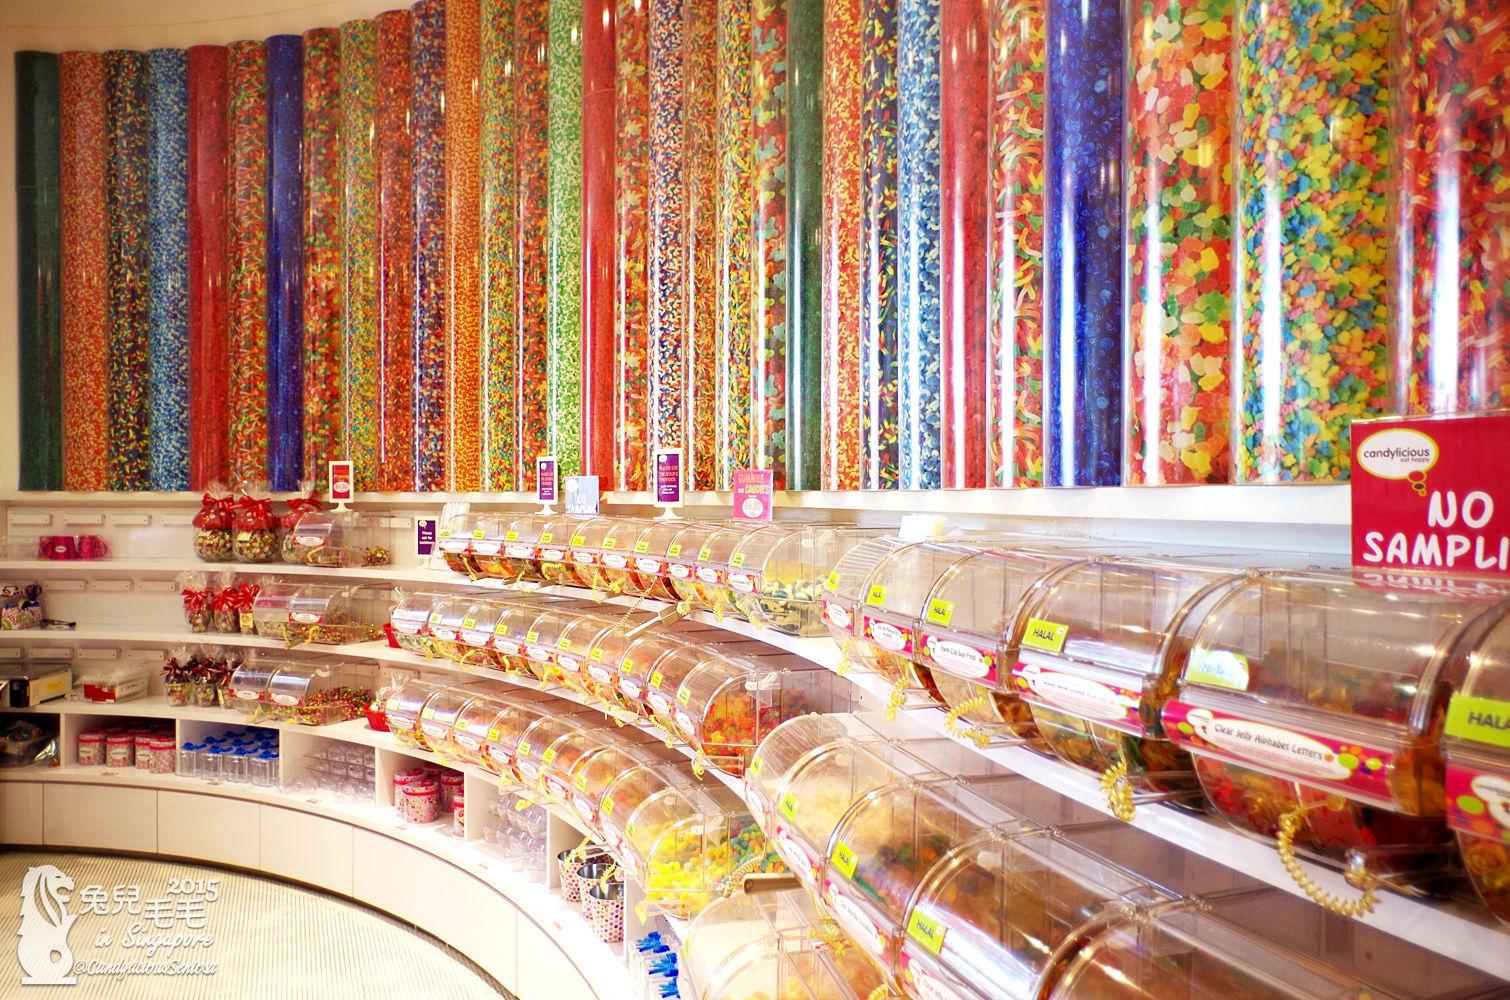 0215-Candylicious-15.jpg